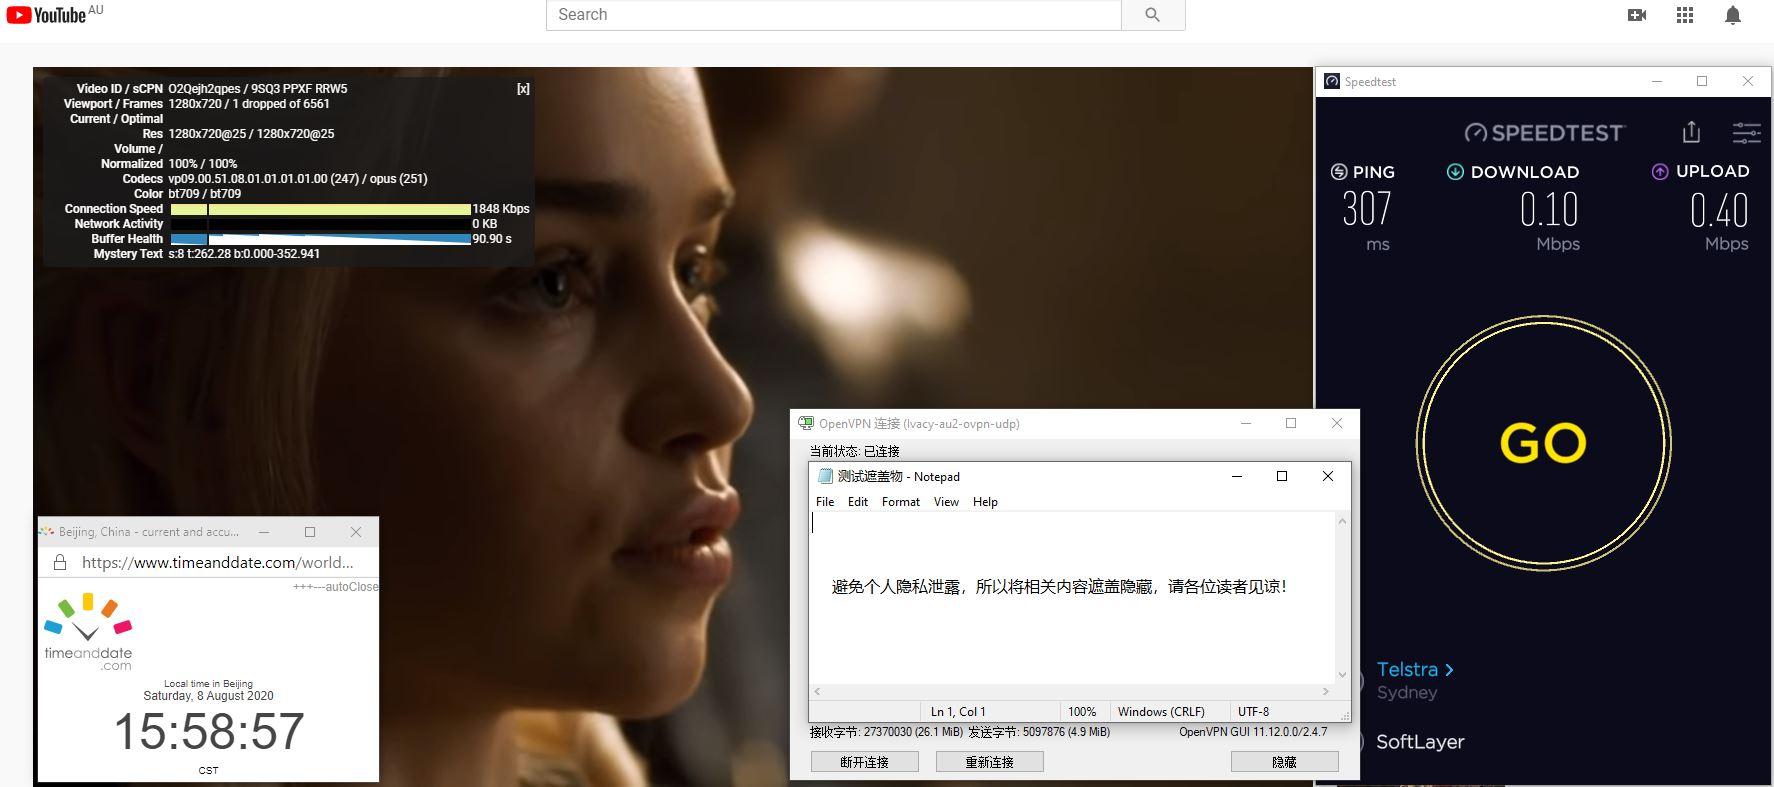 Windows10 IvacyVPN OpenVPN GUI au2 中国VPN 翻墙 科学上网 翻墙速度测试 - 20200808